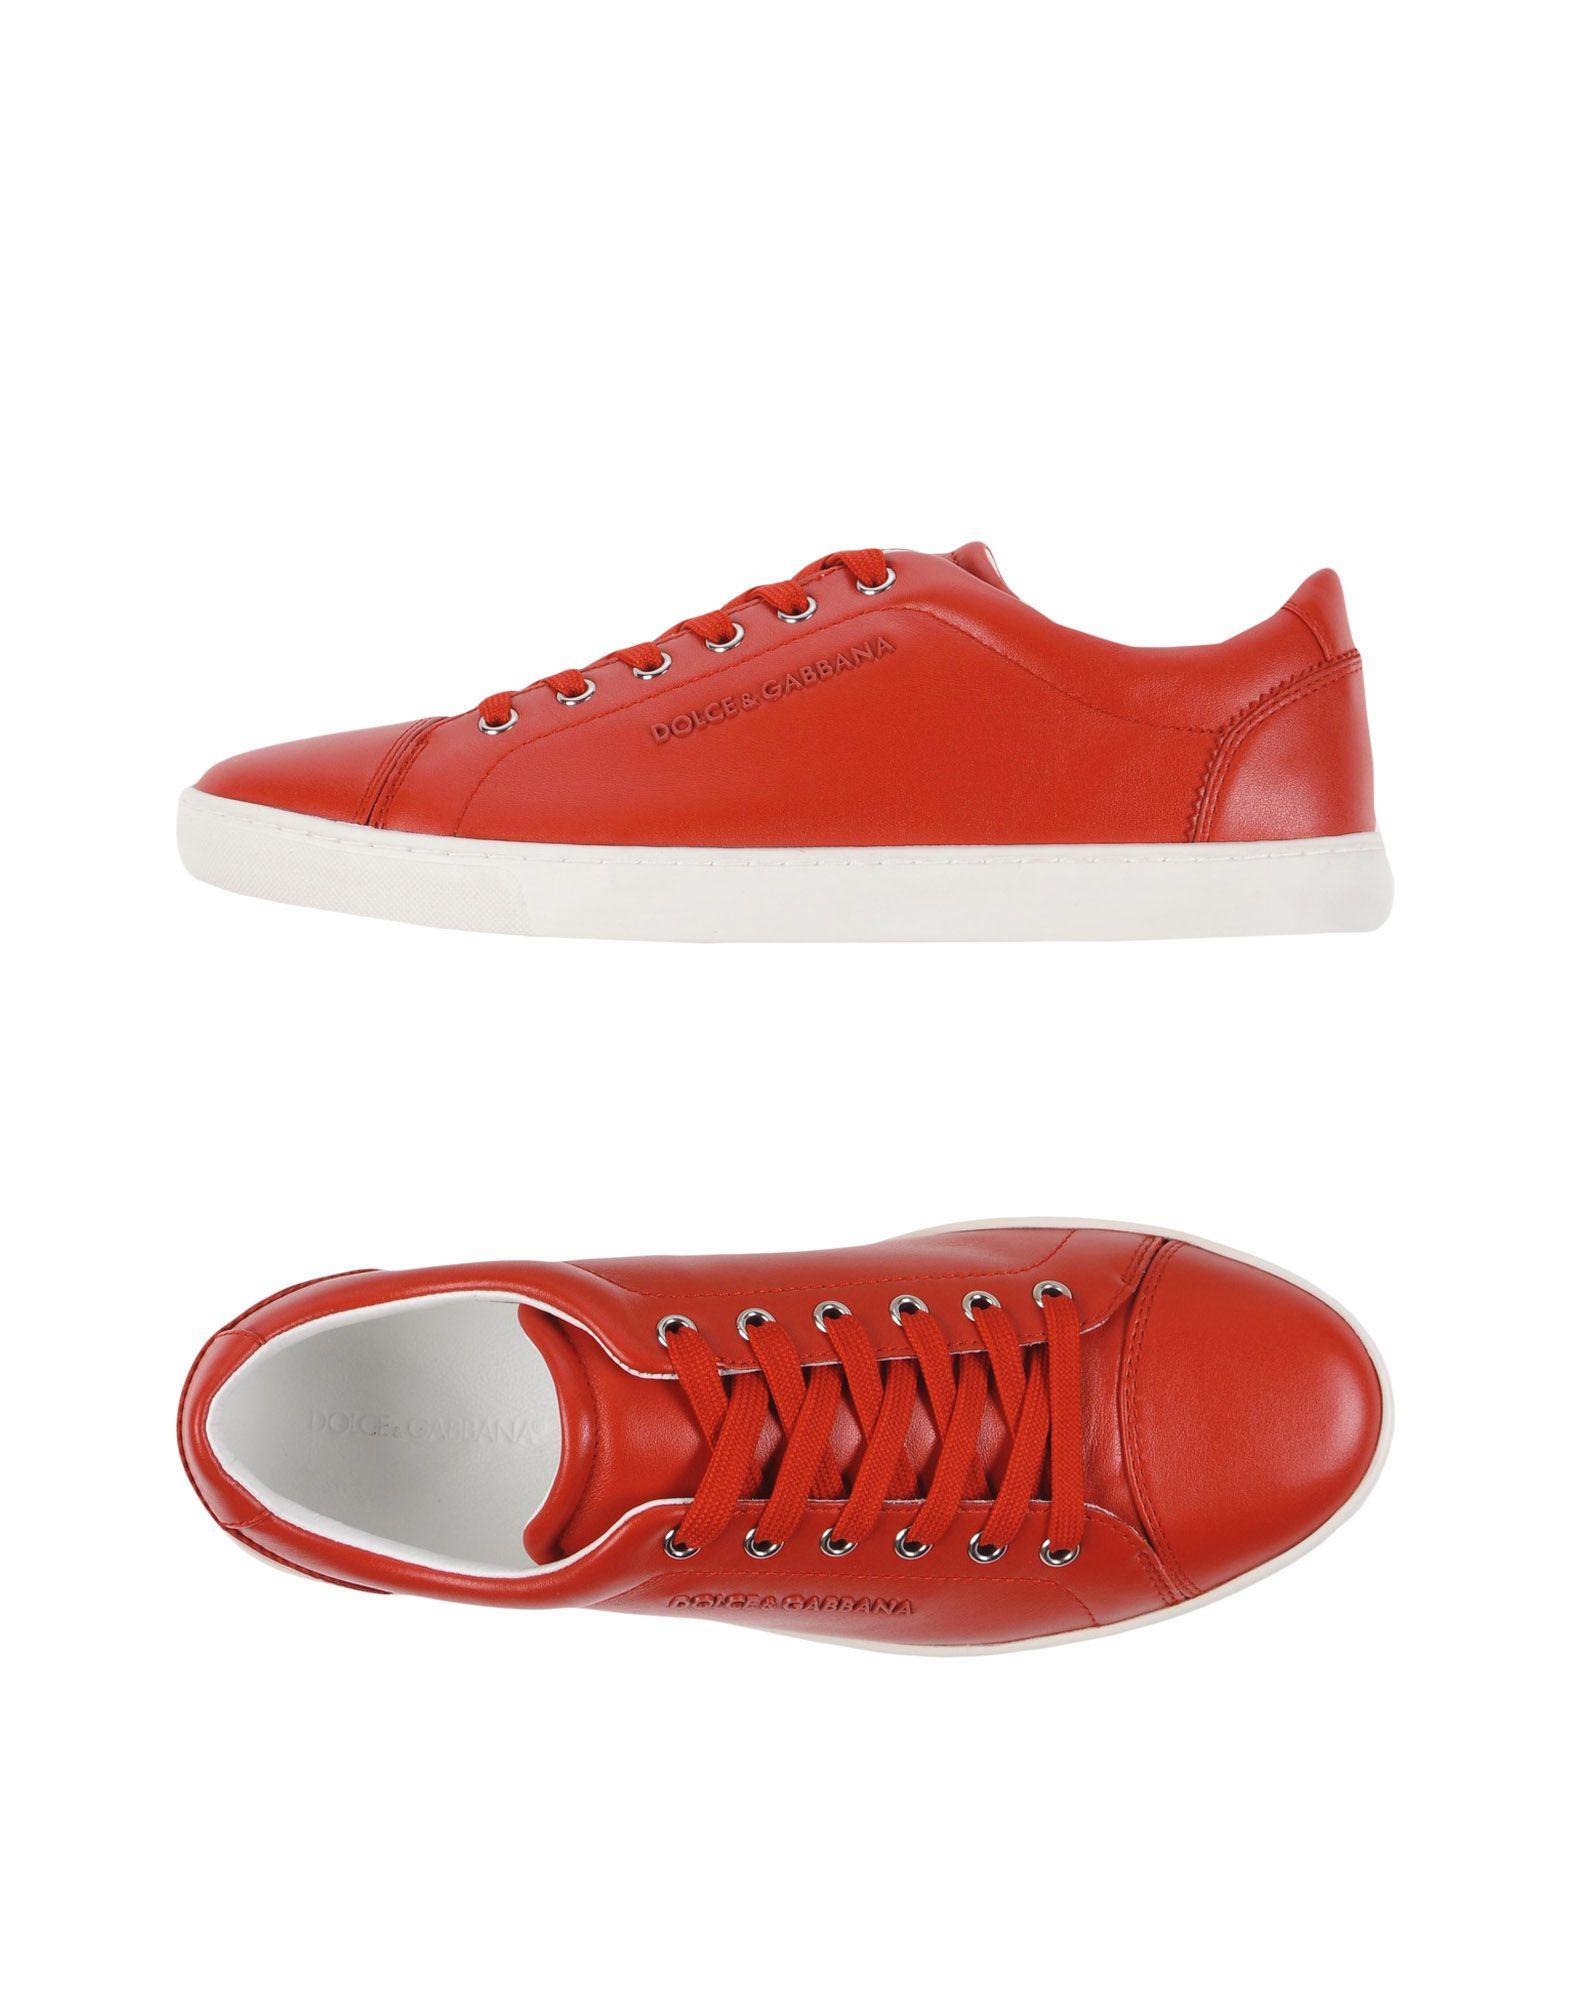 Dolce & Gabbana Sneakers Herren  11124478FQ Gute Qualität beliebte Schuhe